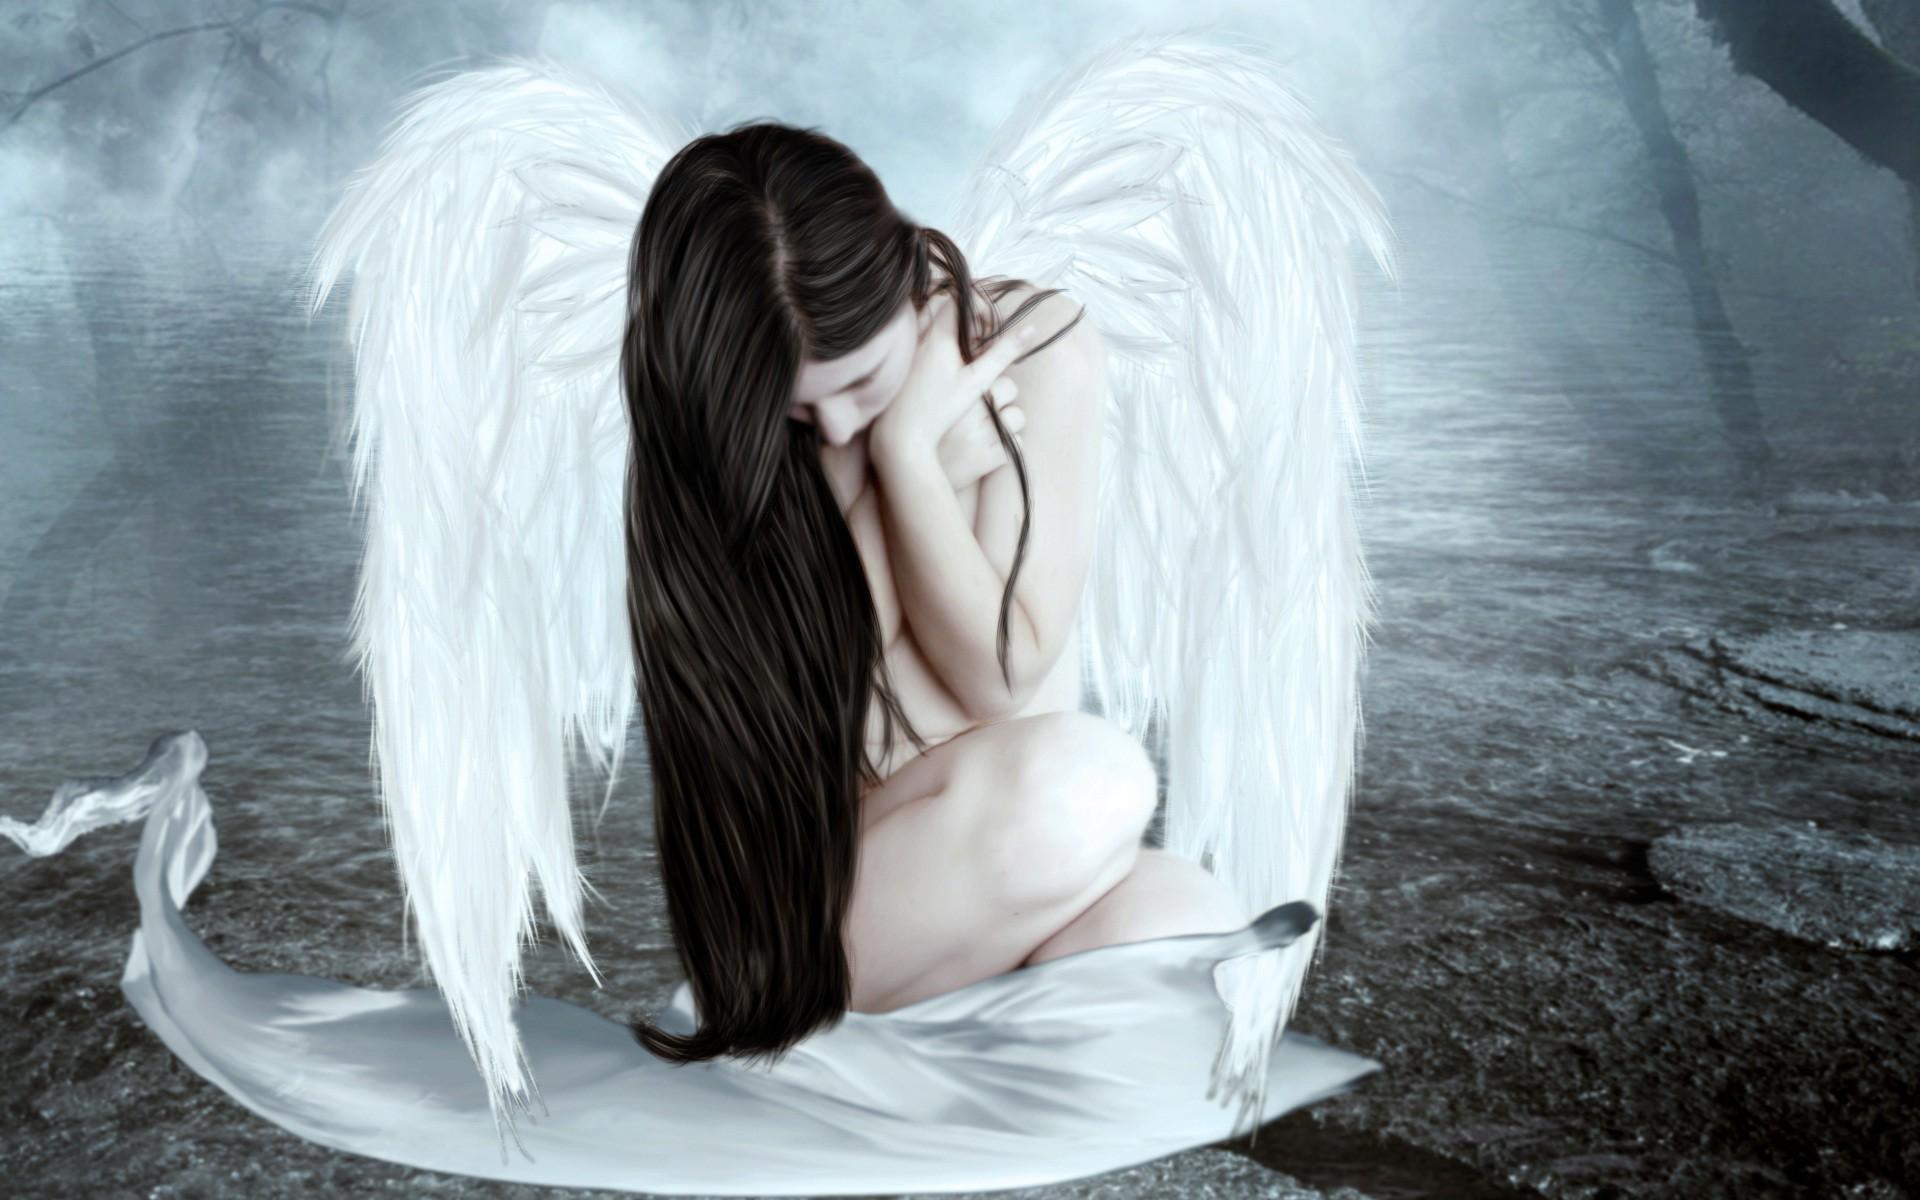 Sad crying angel missing you HD wallpaper | HD Wallpapers Rocks